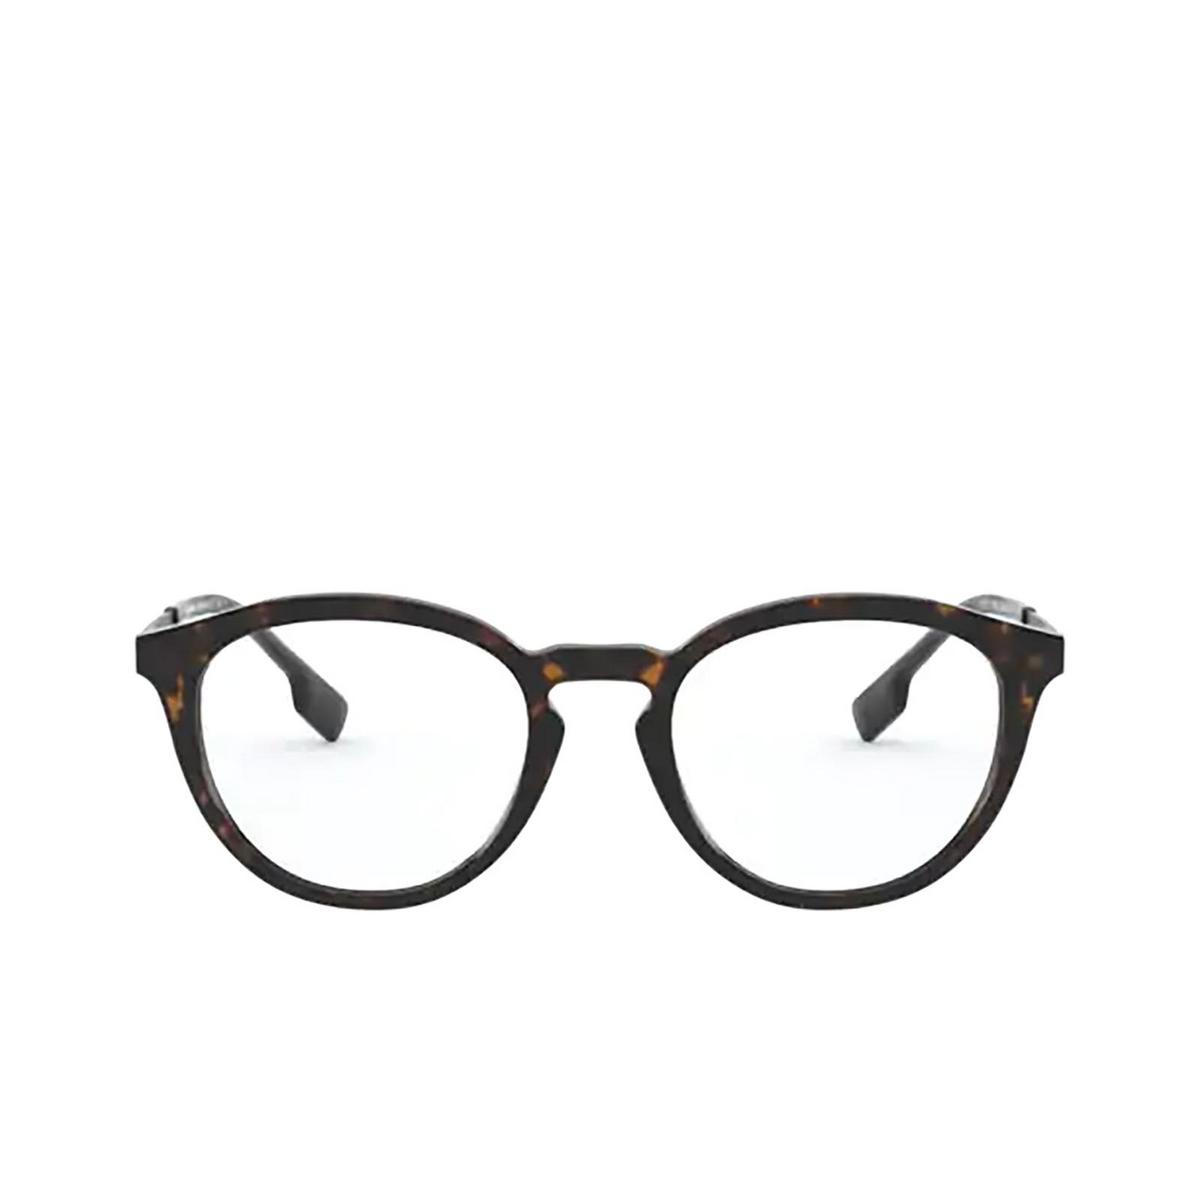 Burberry® Round Eyeglasses: Keats BE2321 color Dark Havana 3002 - front view.